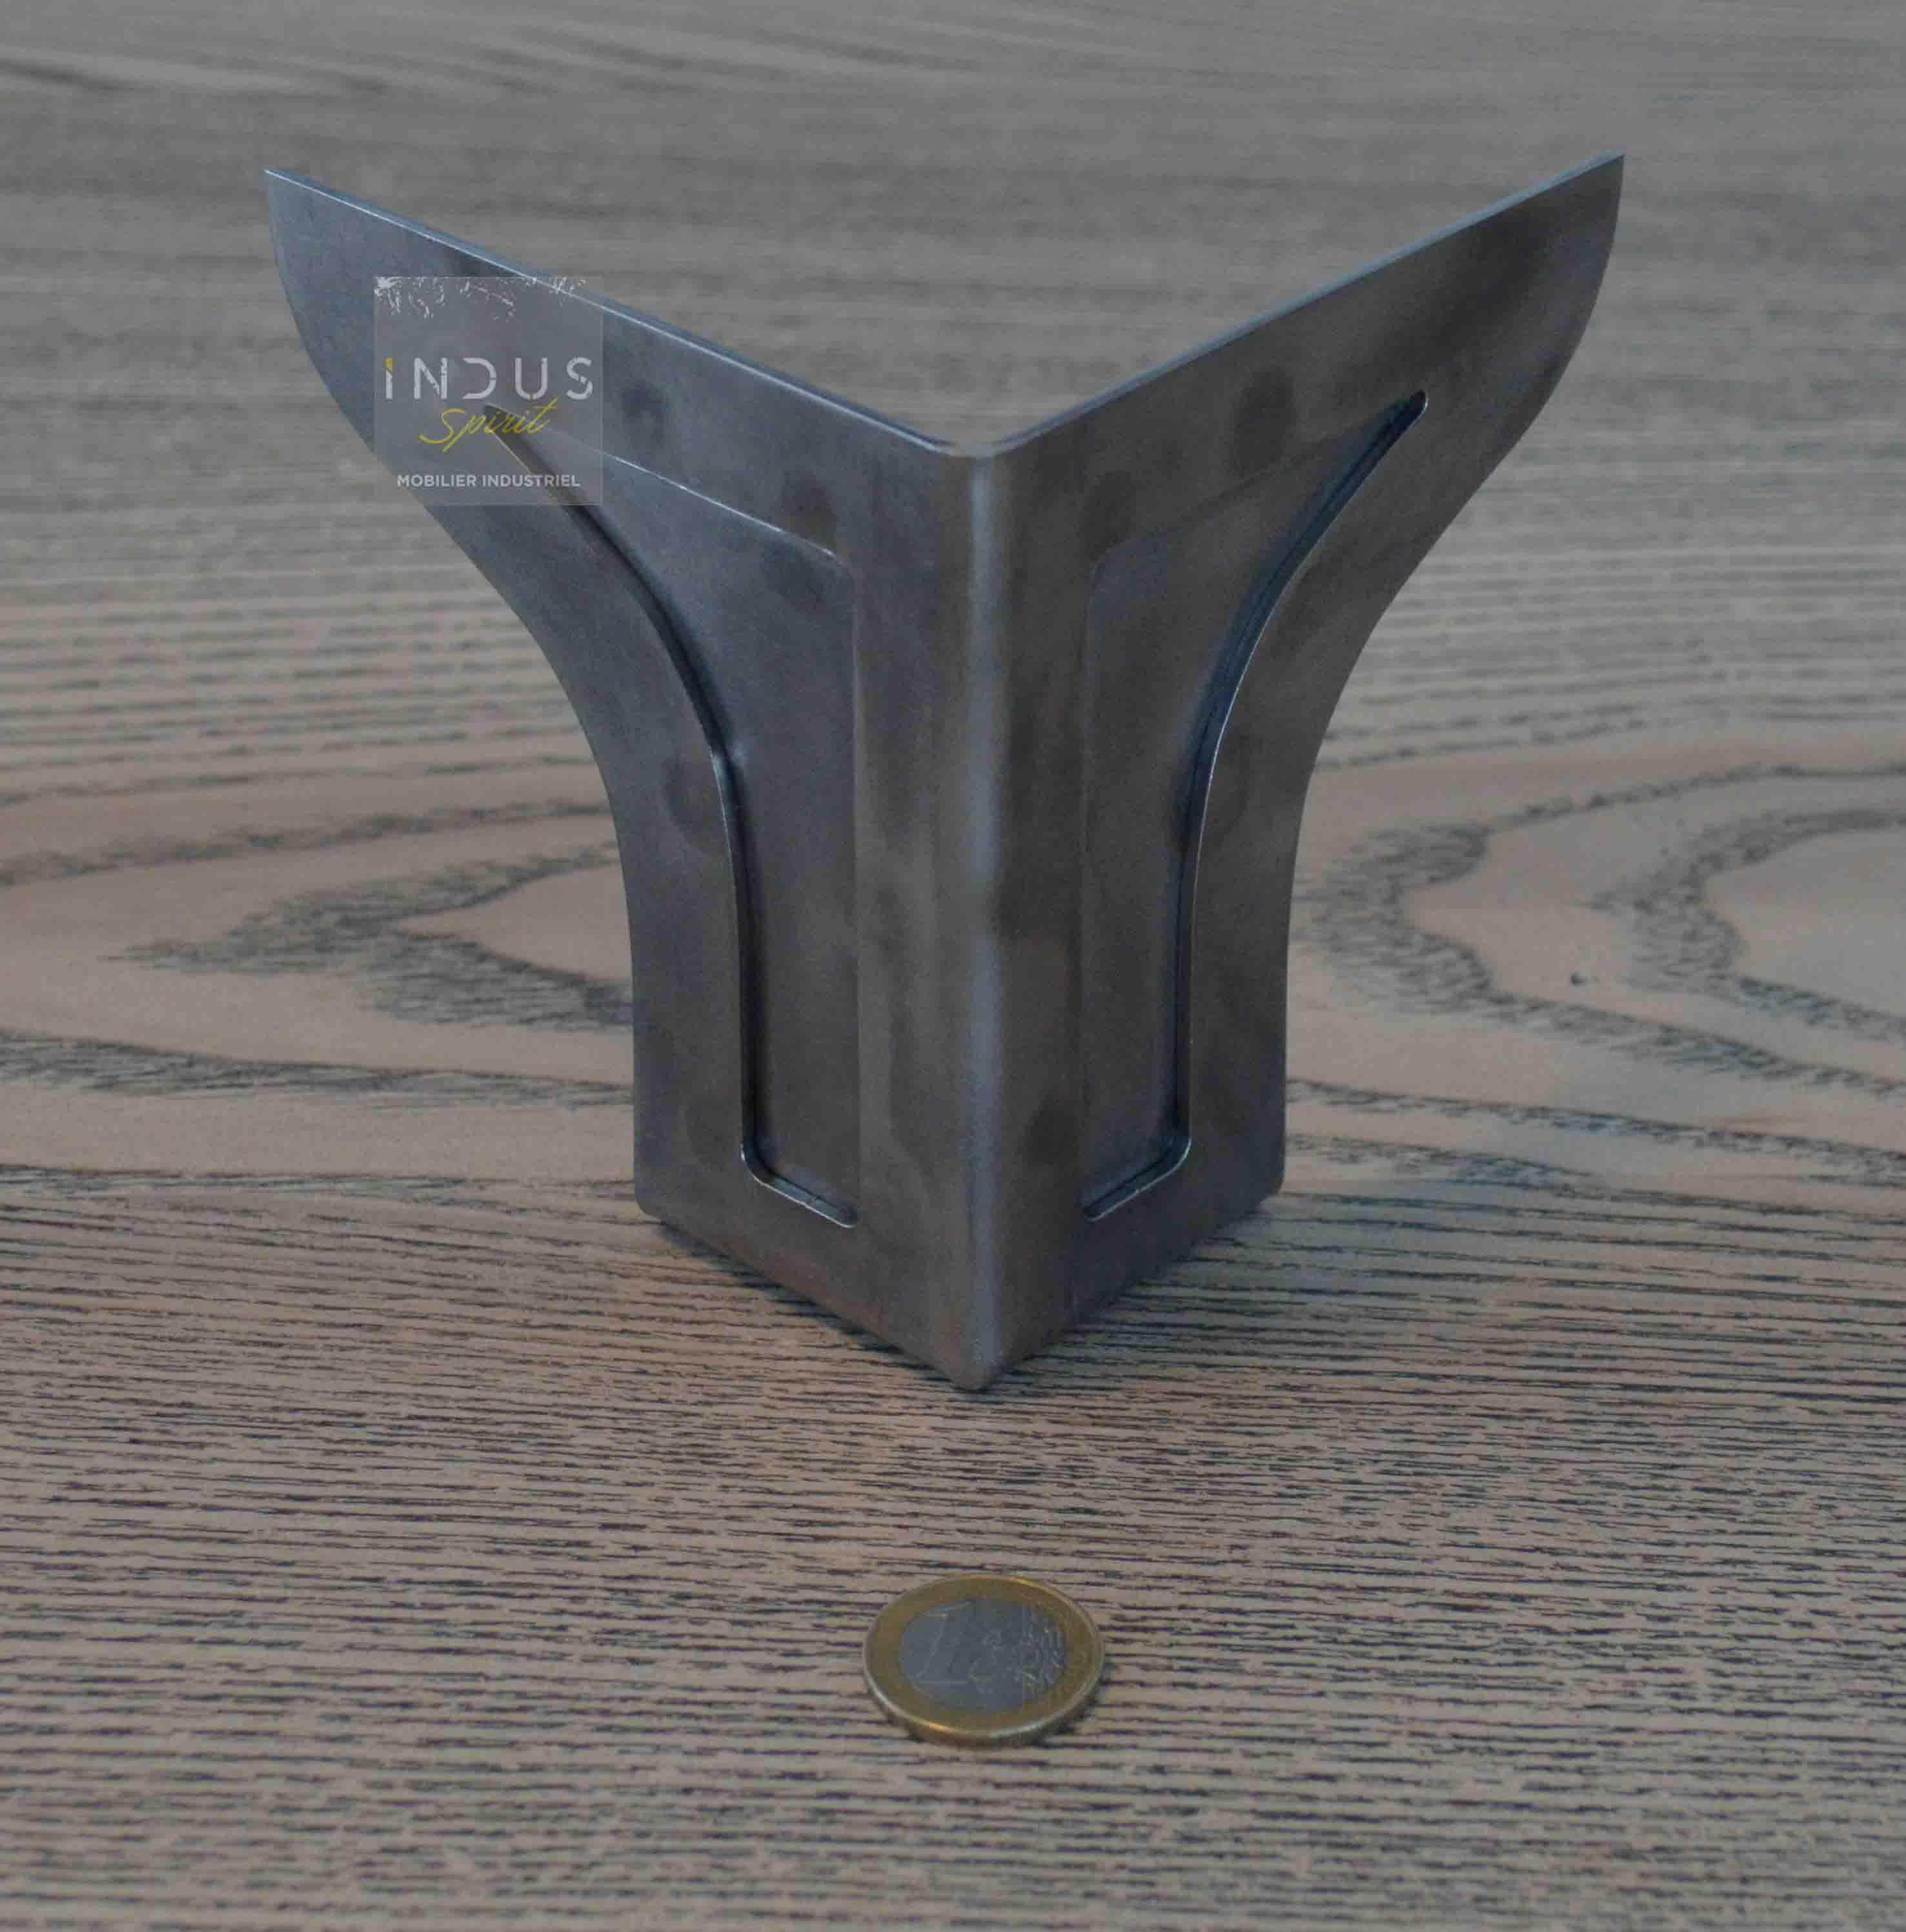 pied de meuble metallique industriel